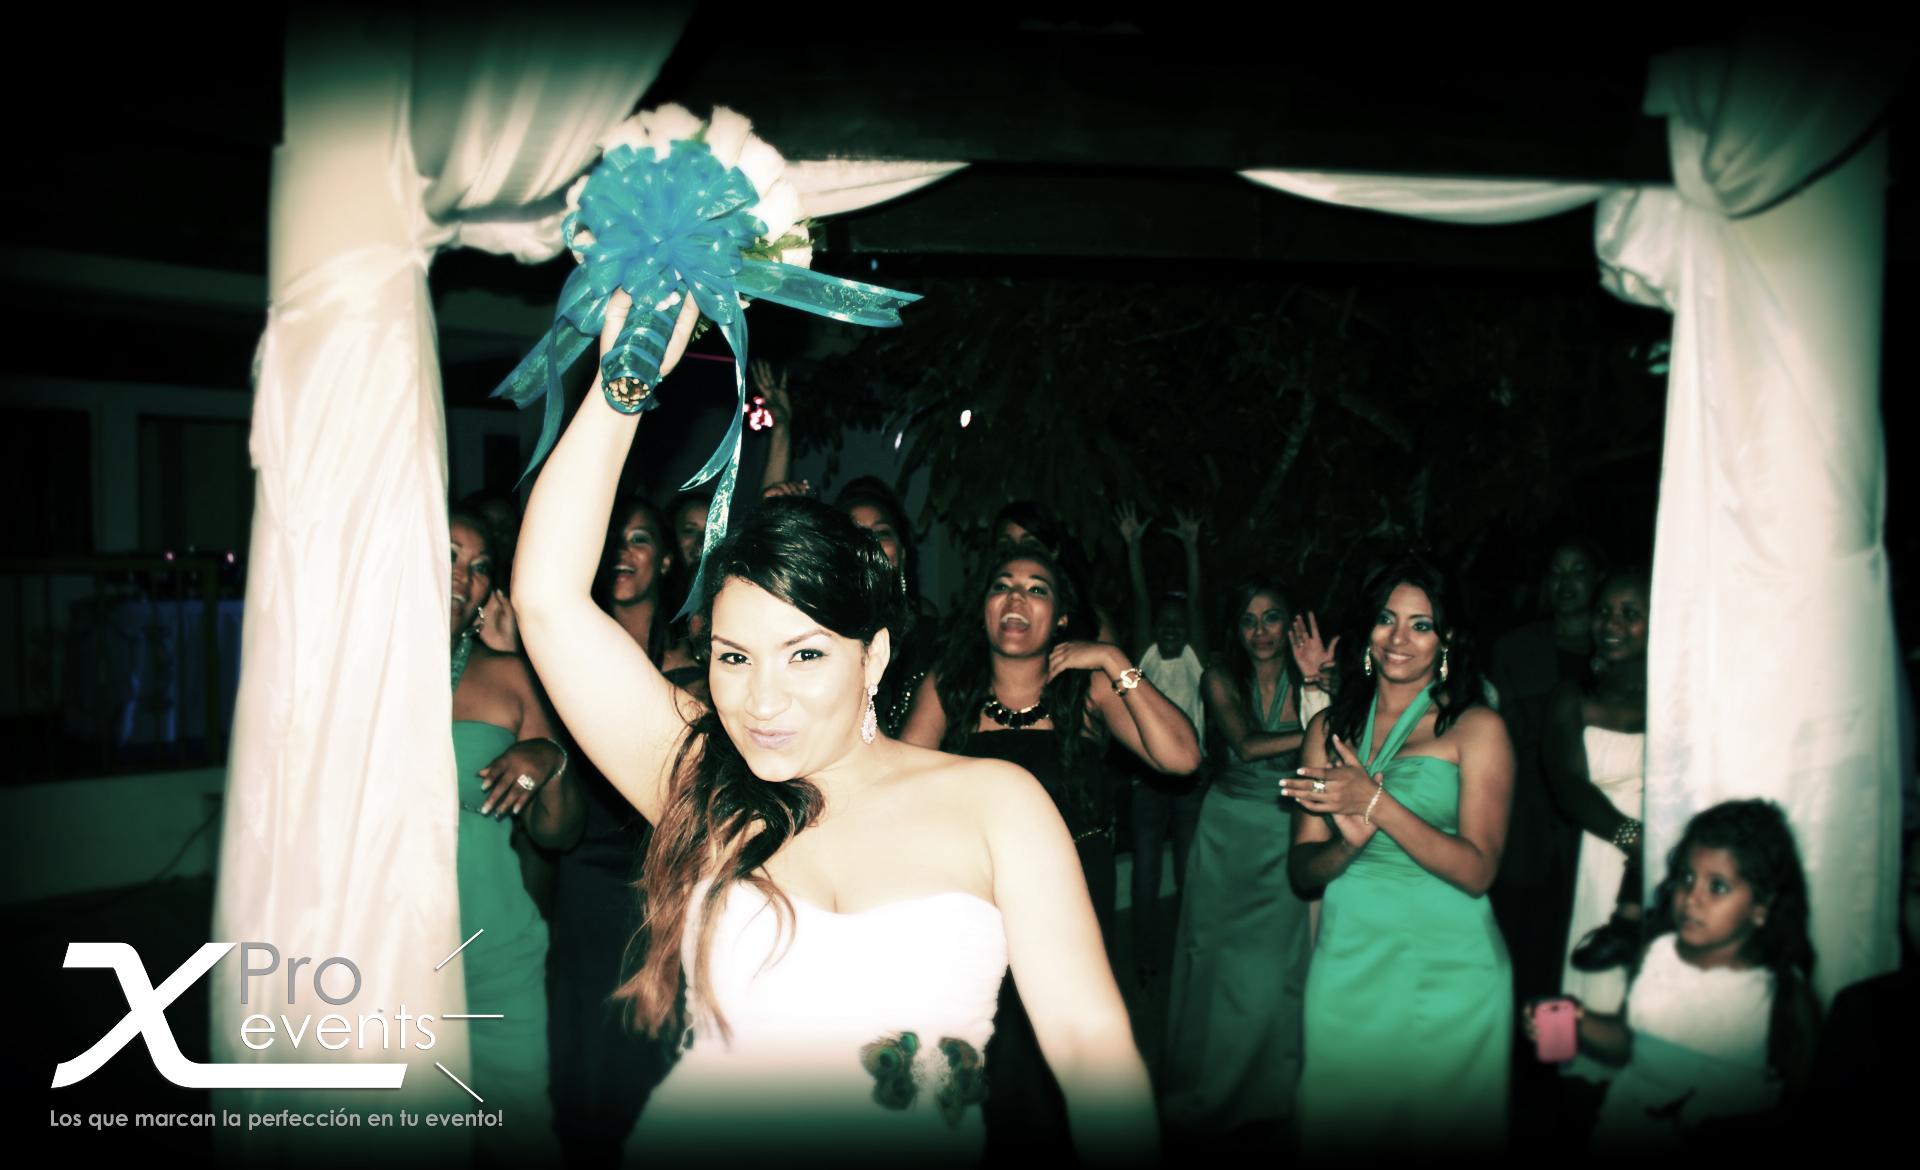 www.Xproevents.com - Captura los mejores momentos de tu boda.JPG